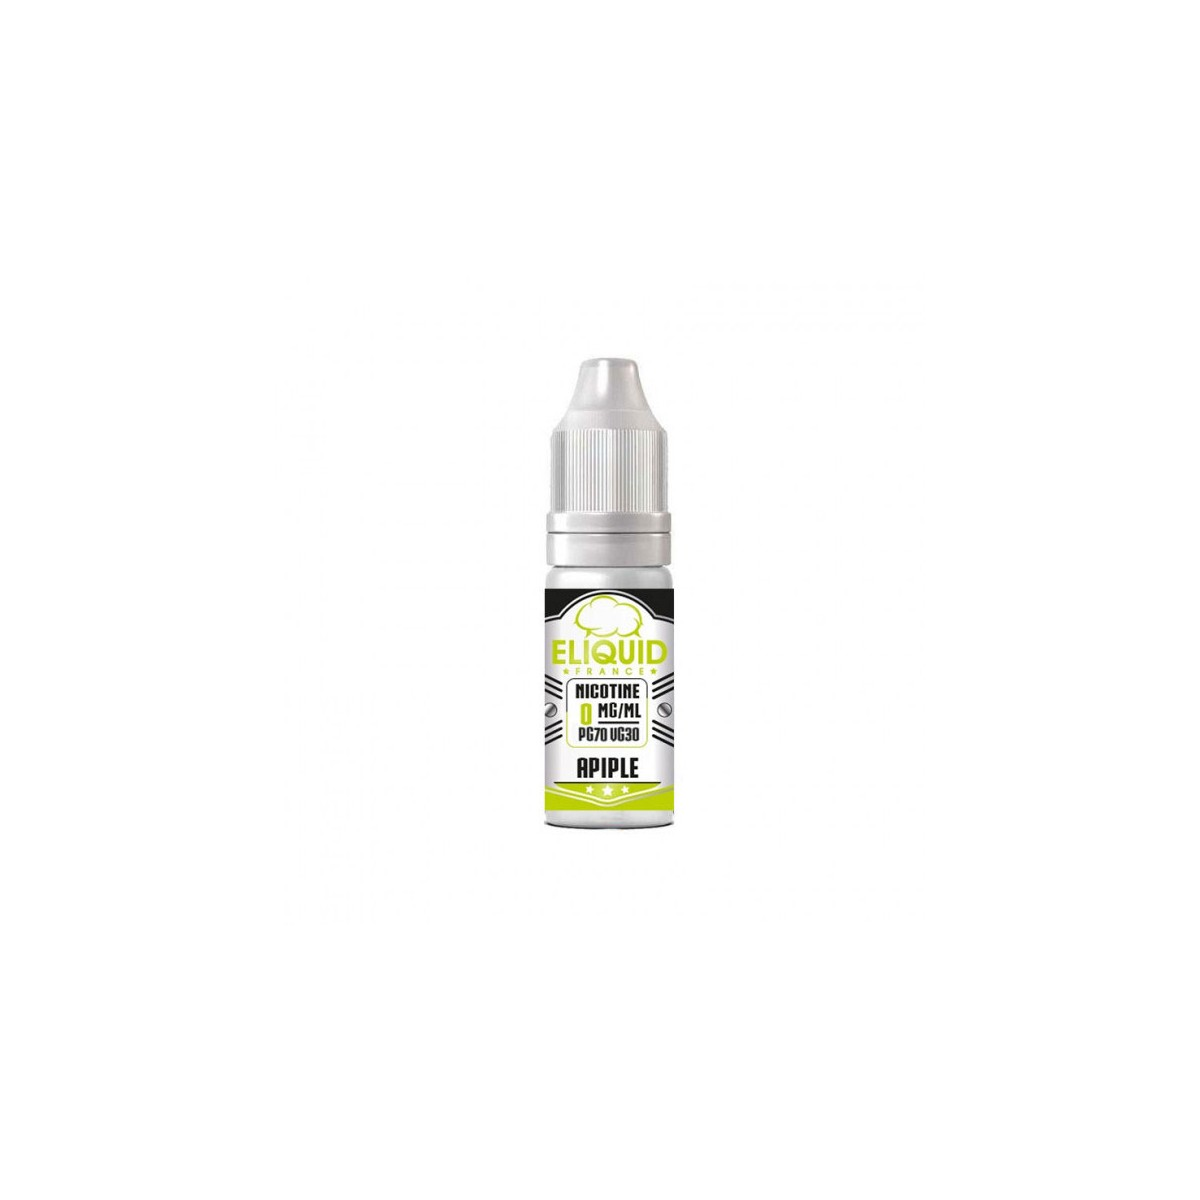 Eliquid France - Apiple (Mela) 10ml  -0mg/ml